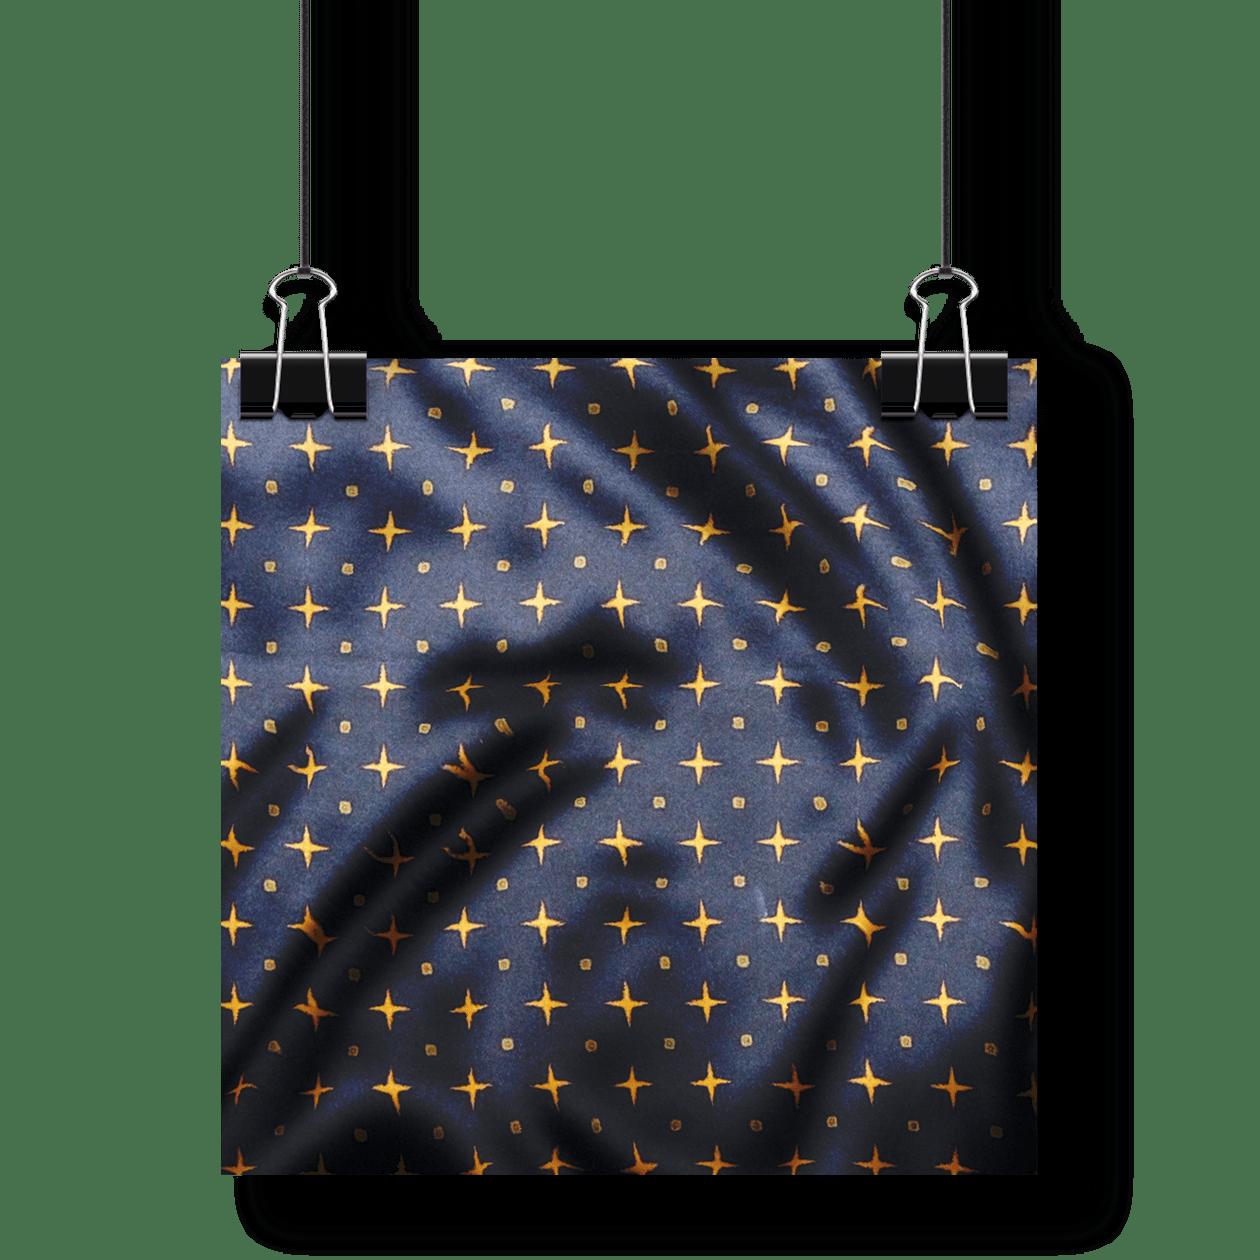 jason-b-graham-thefad-co-printed-silk-0013